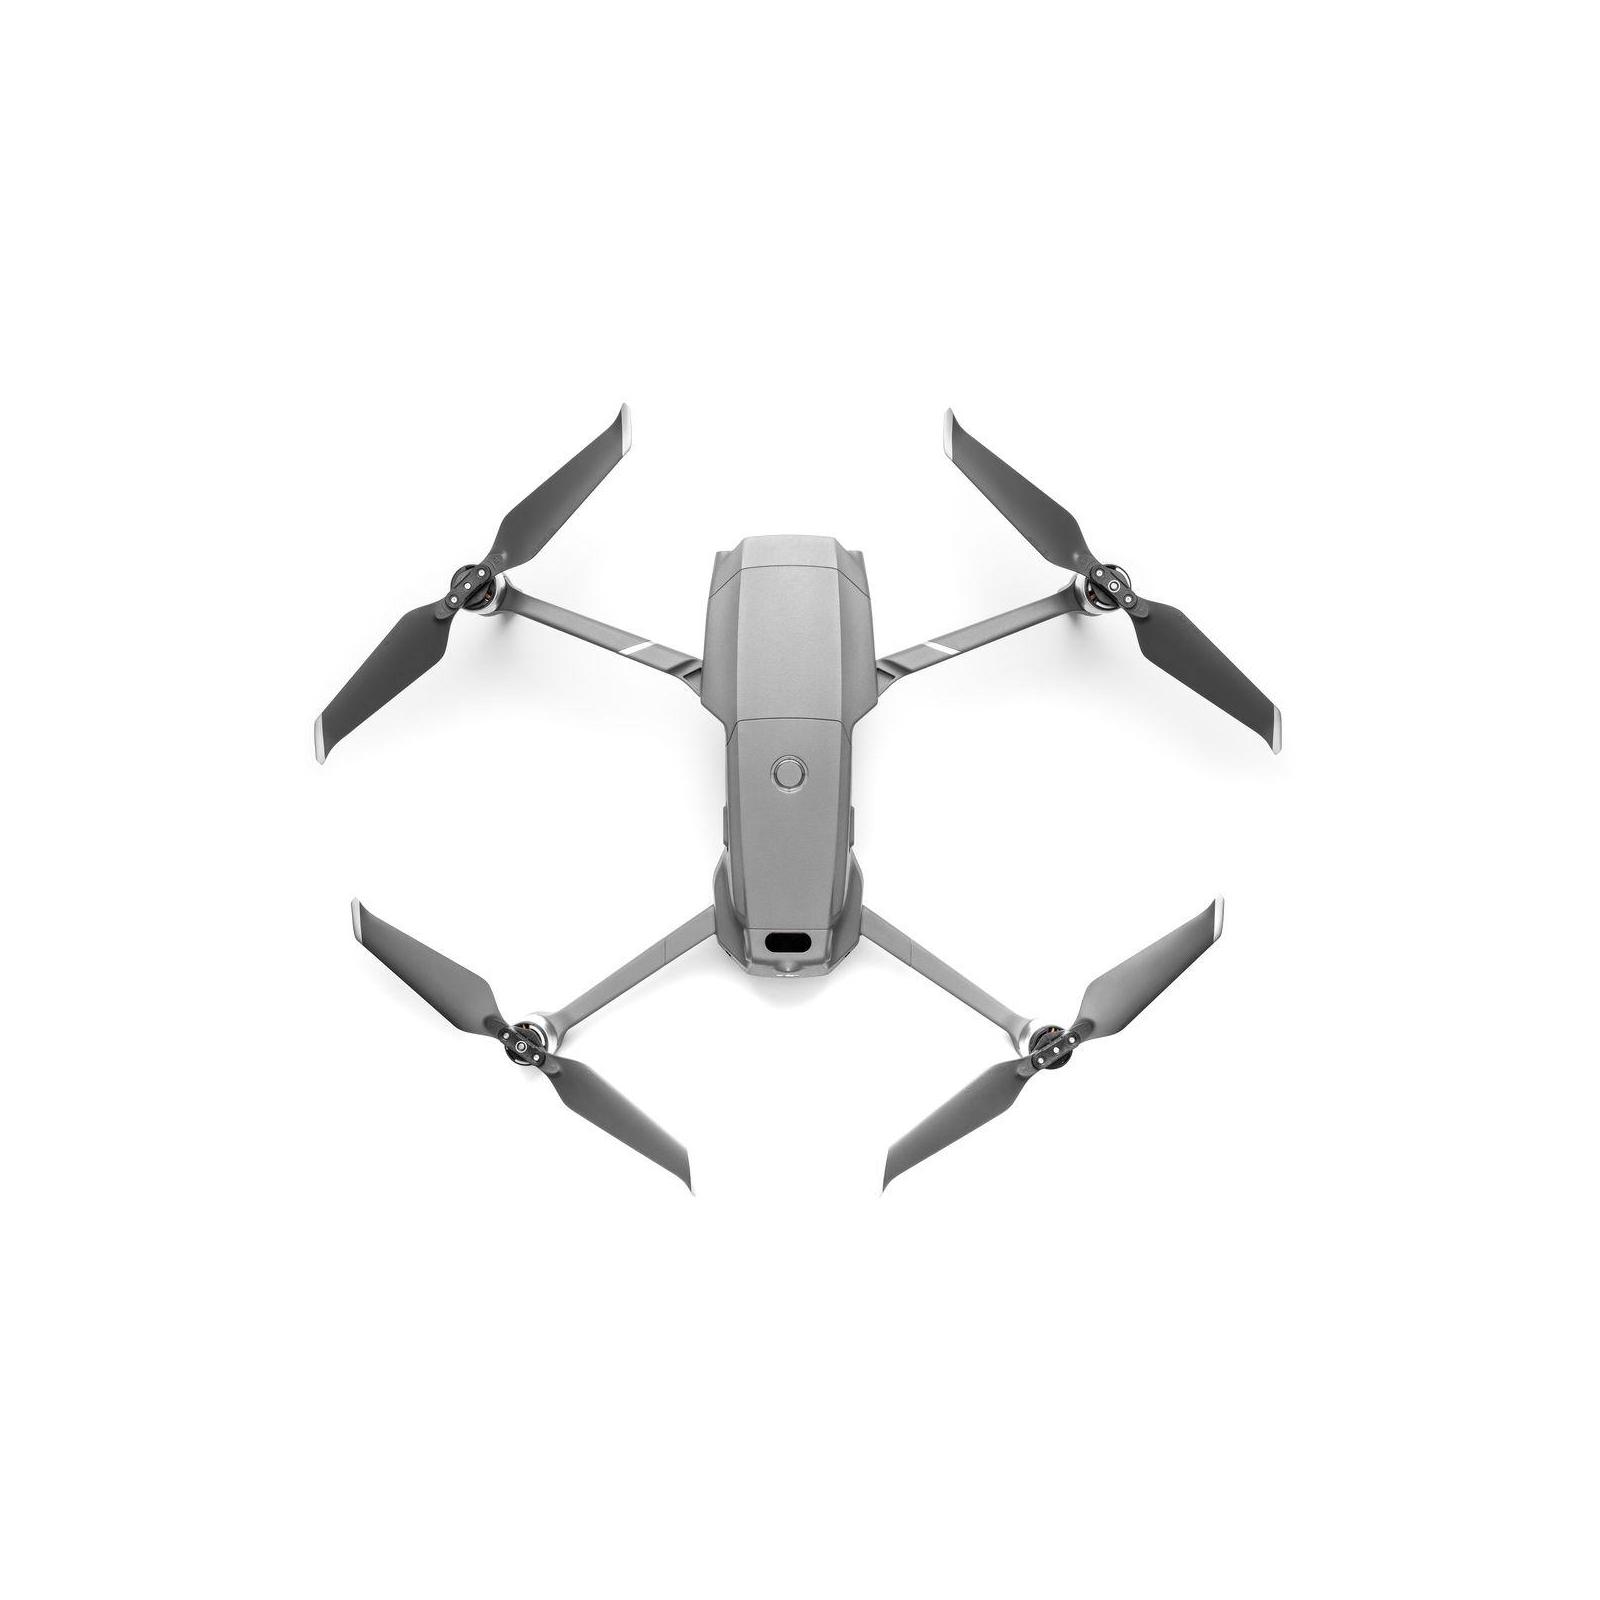 Квадрокоптер DJI Mavic 2 Pro (CP.MA.00000013.01) изображение 4